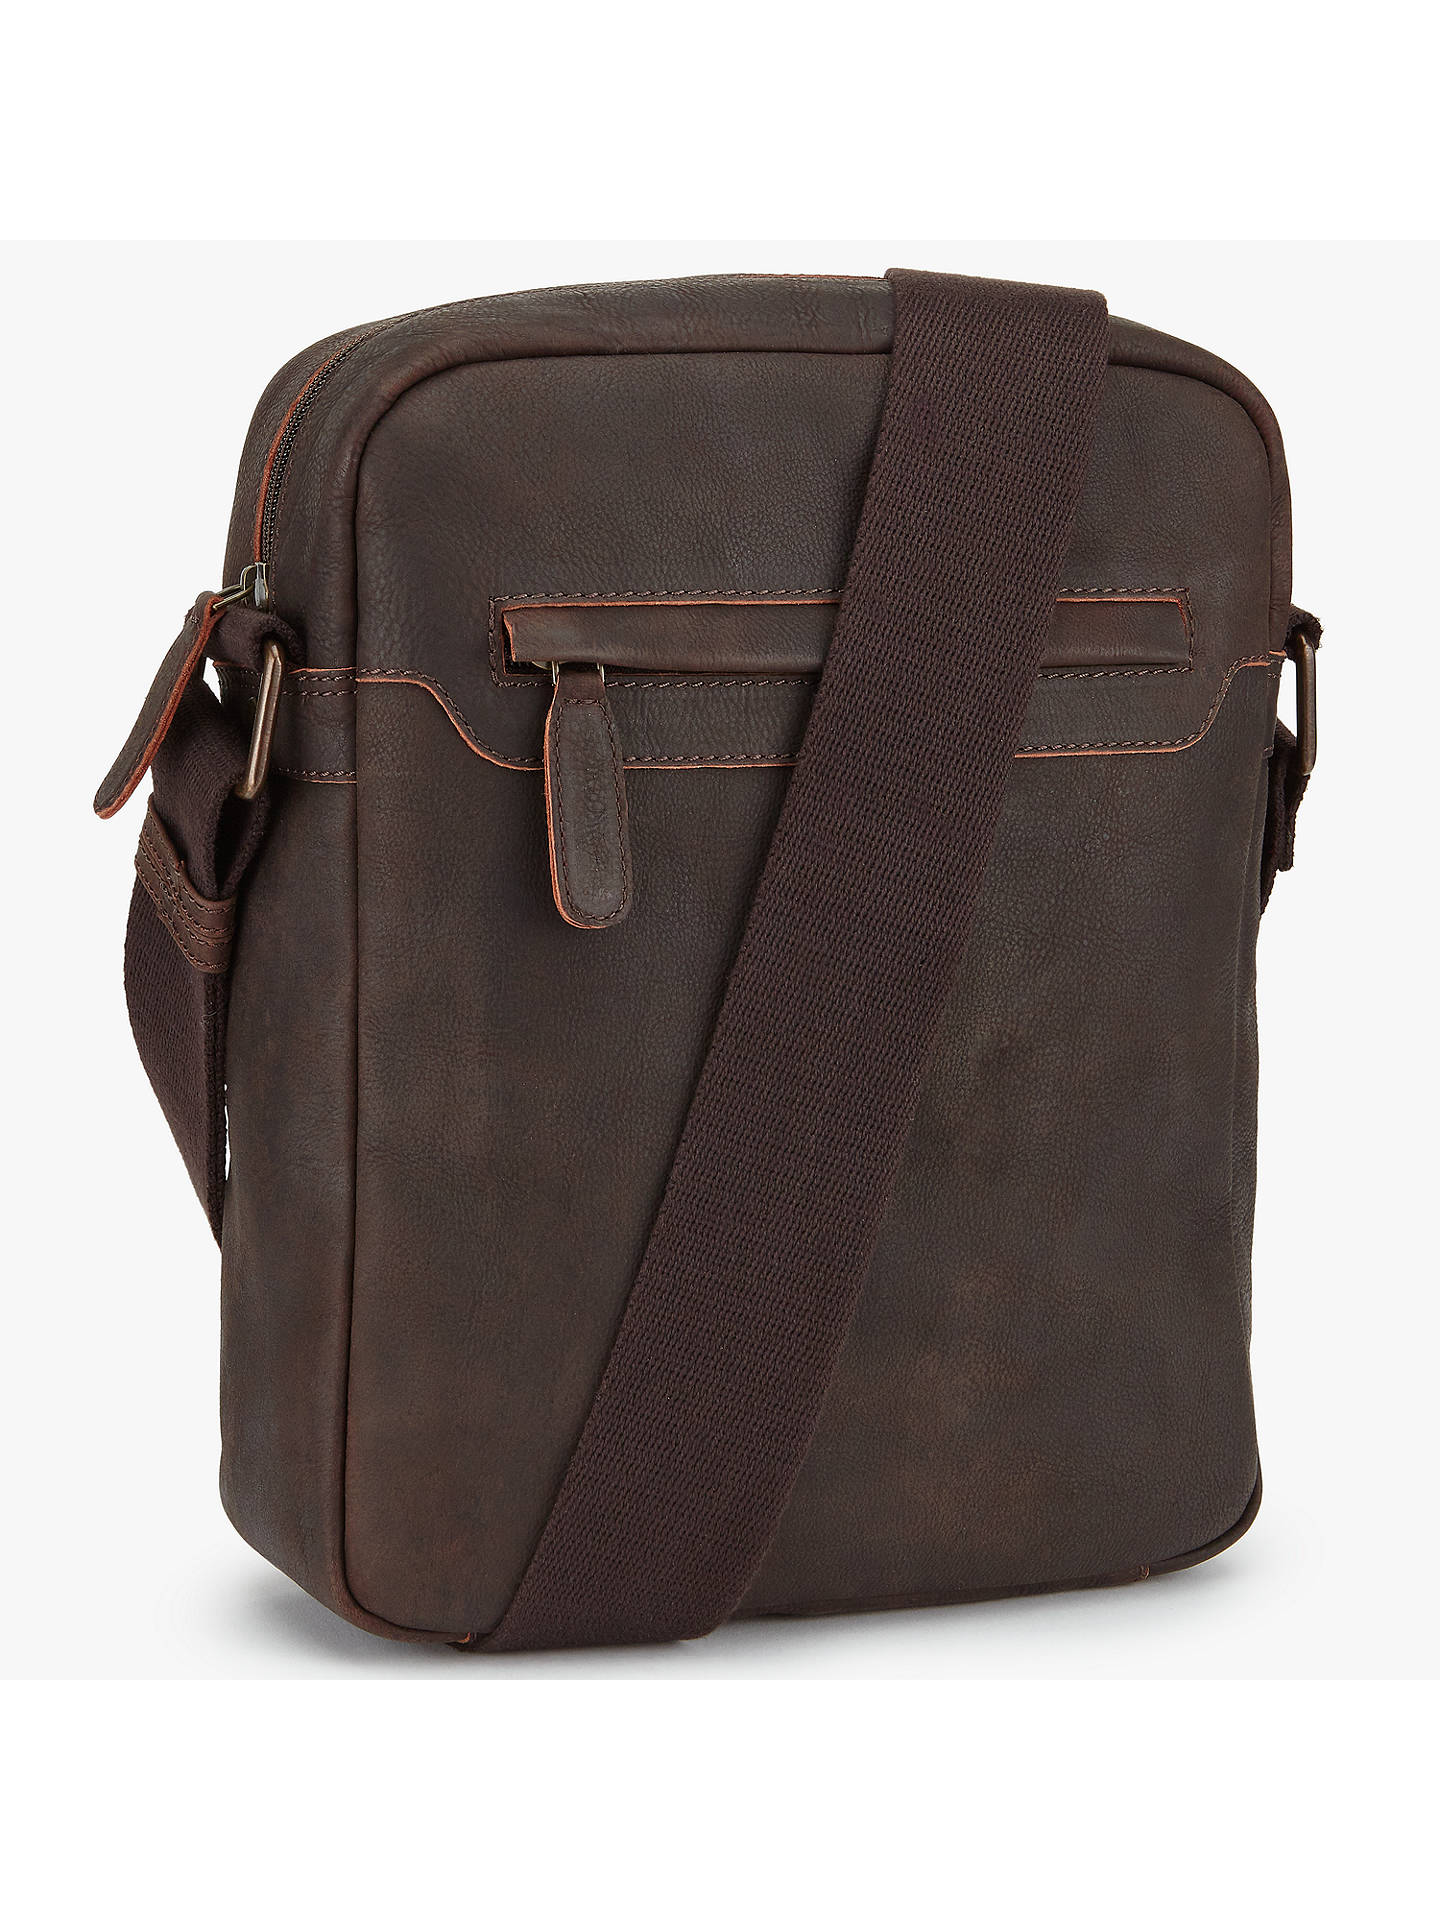 John Lewis Partners Toronto Leather Reporter Bag Brown Online At Johnlewis